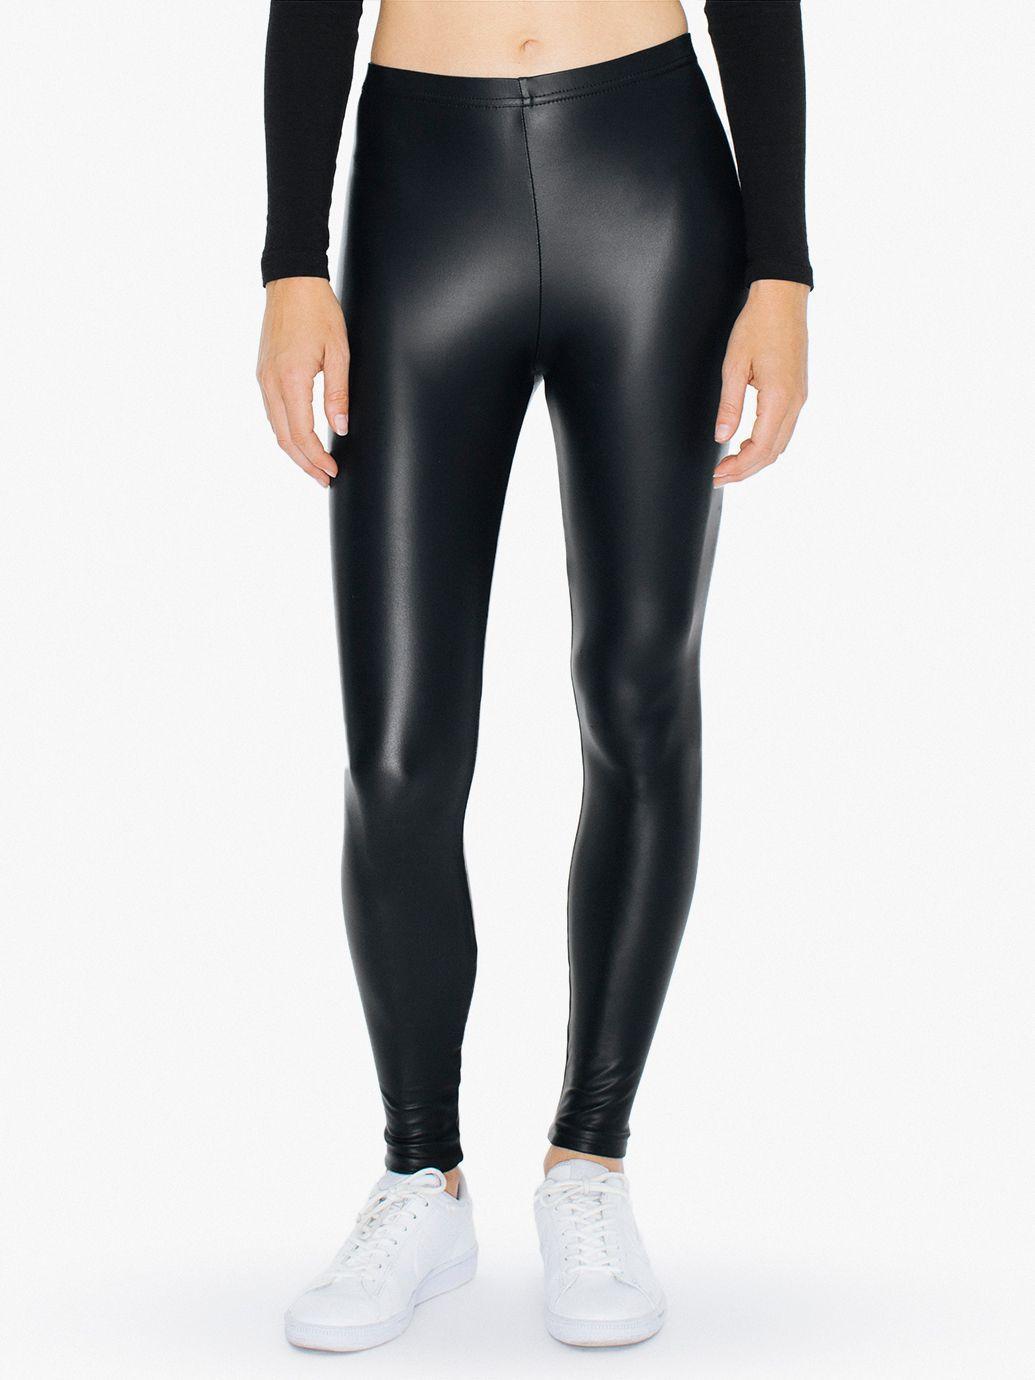 bf32b79d2ea9ac Metallic Legging   American Apparel   -WishList in 2019   Black ...